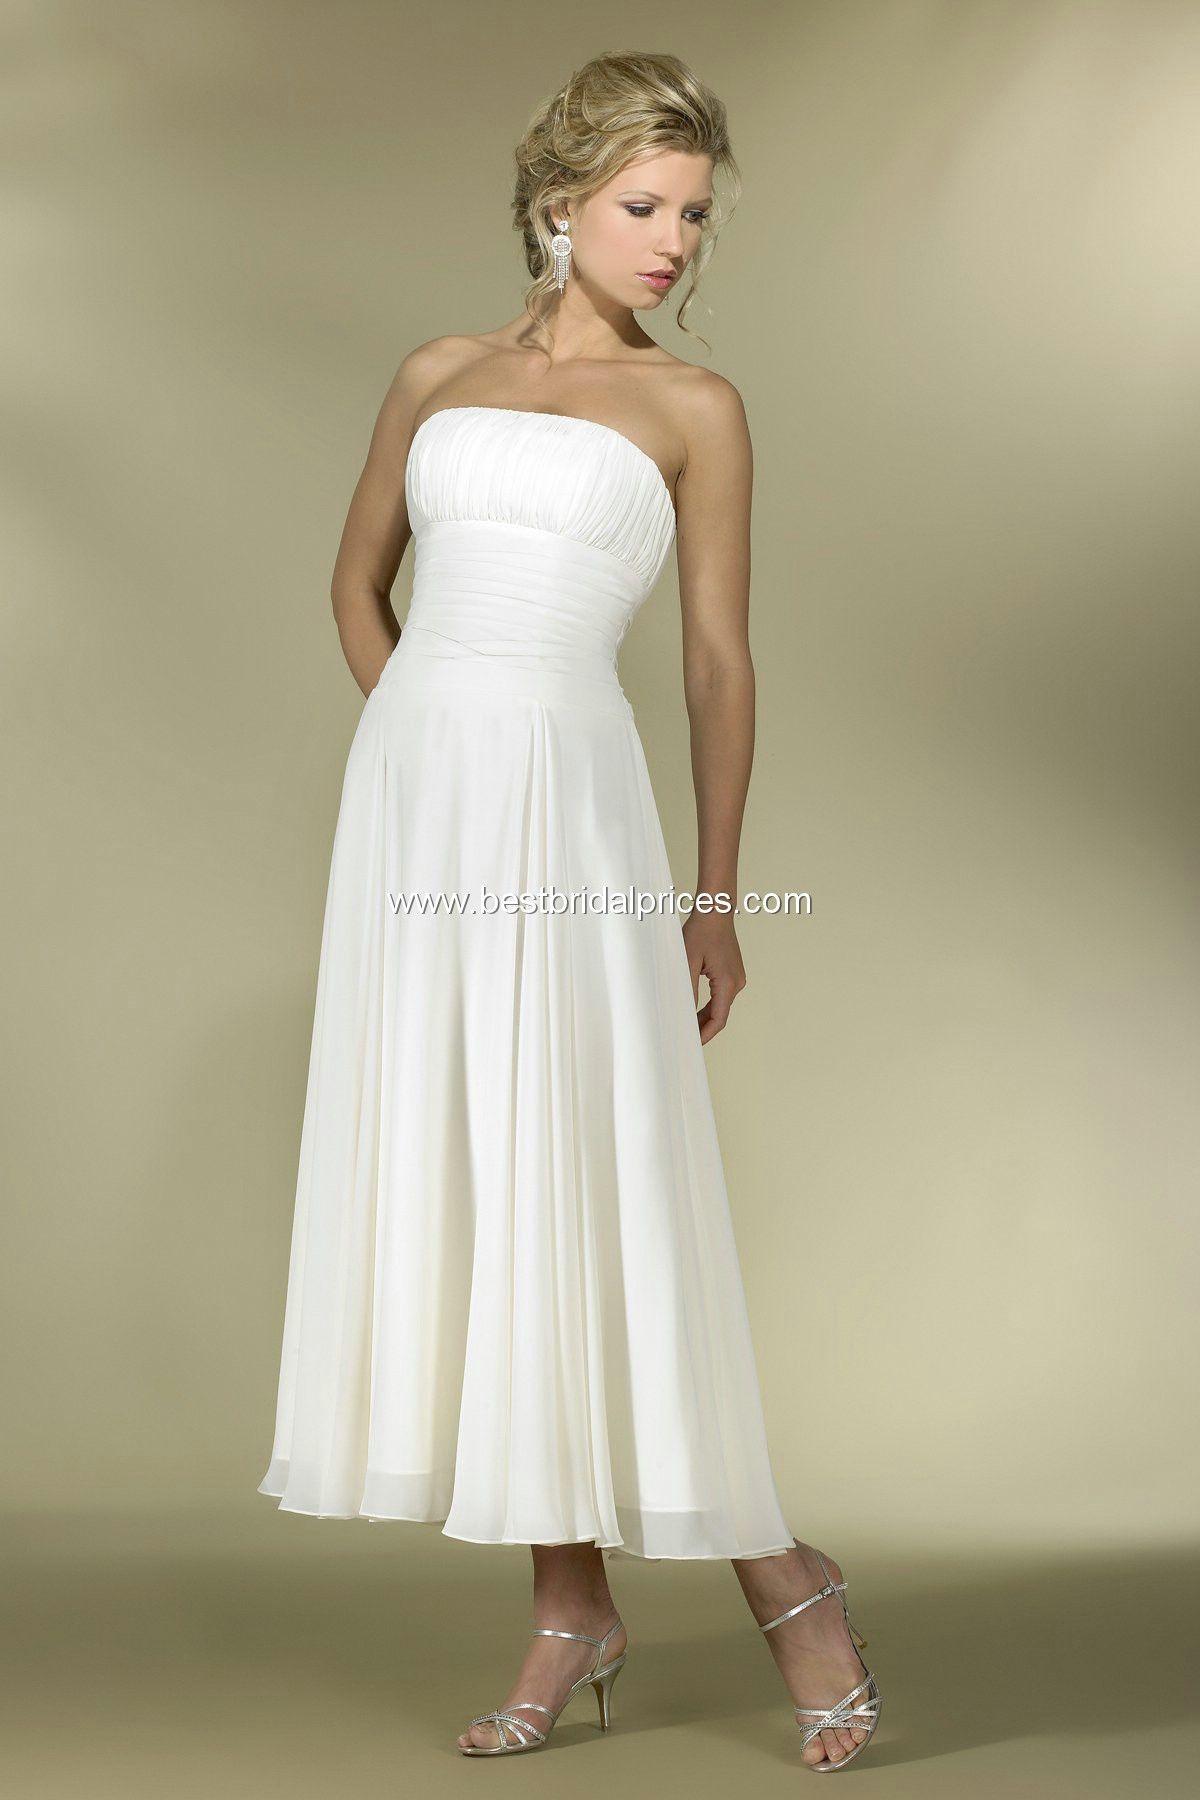 Informal outdoor - country - beach wedding dress. Reasonable price ...